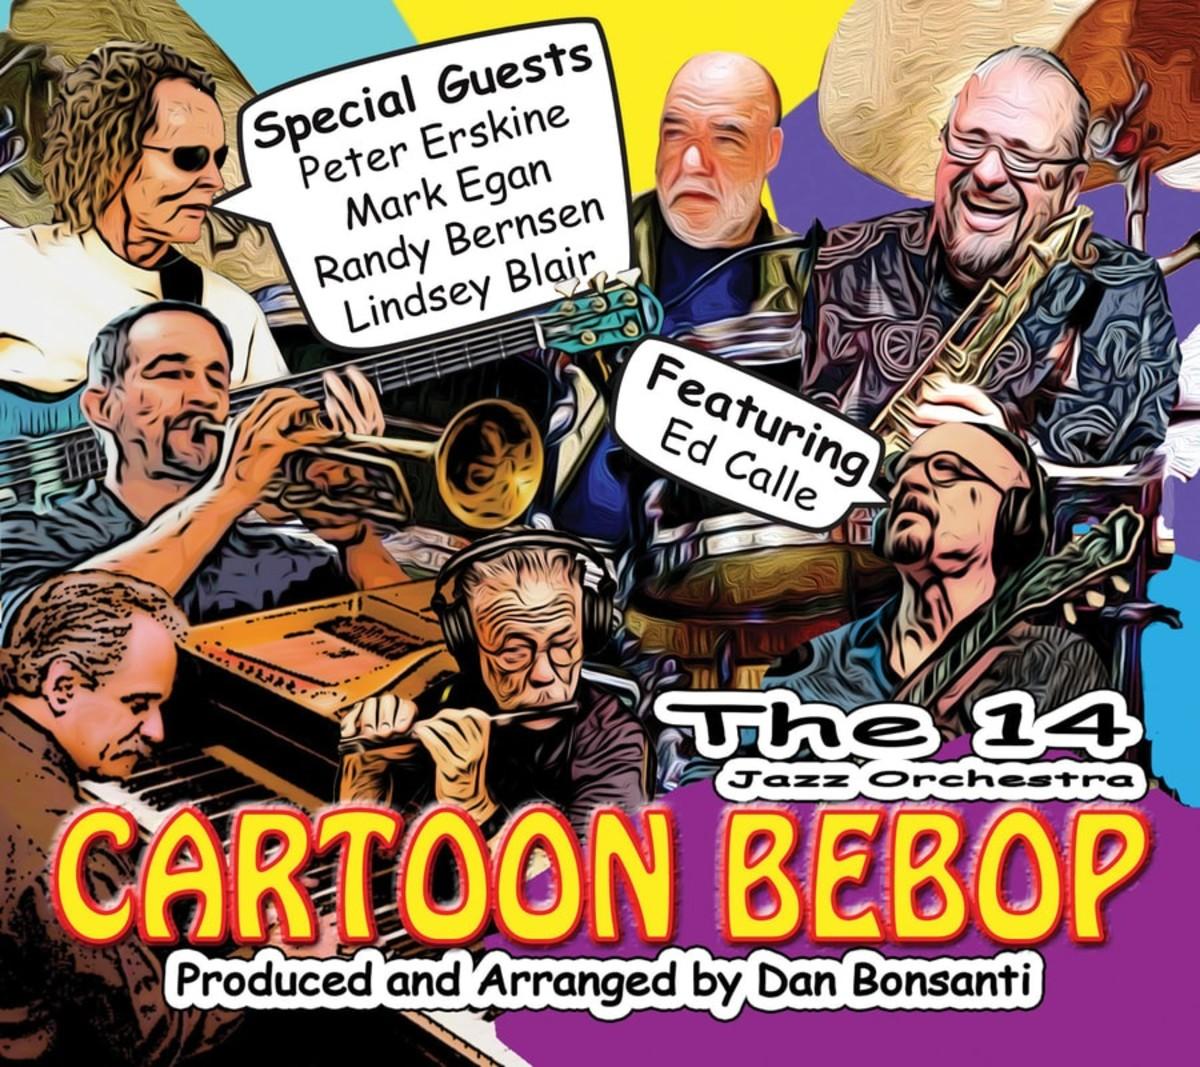 Cartoon Bebop